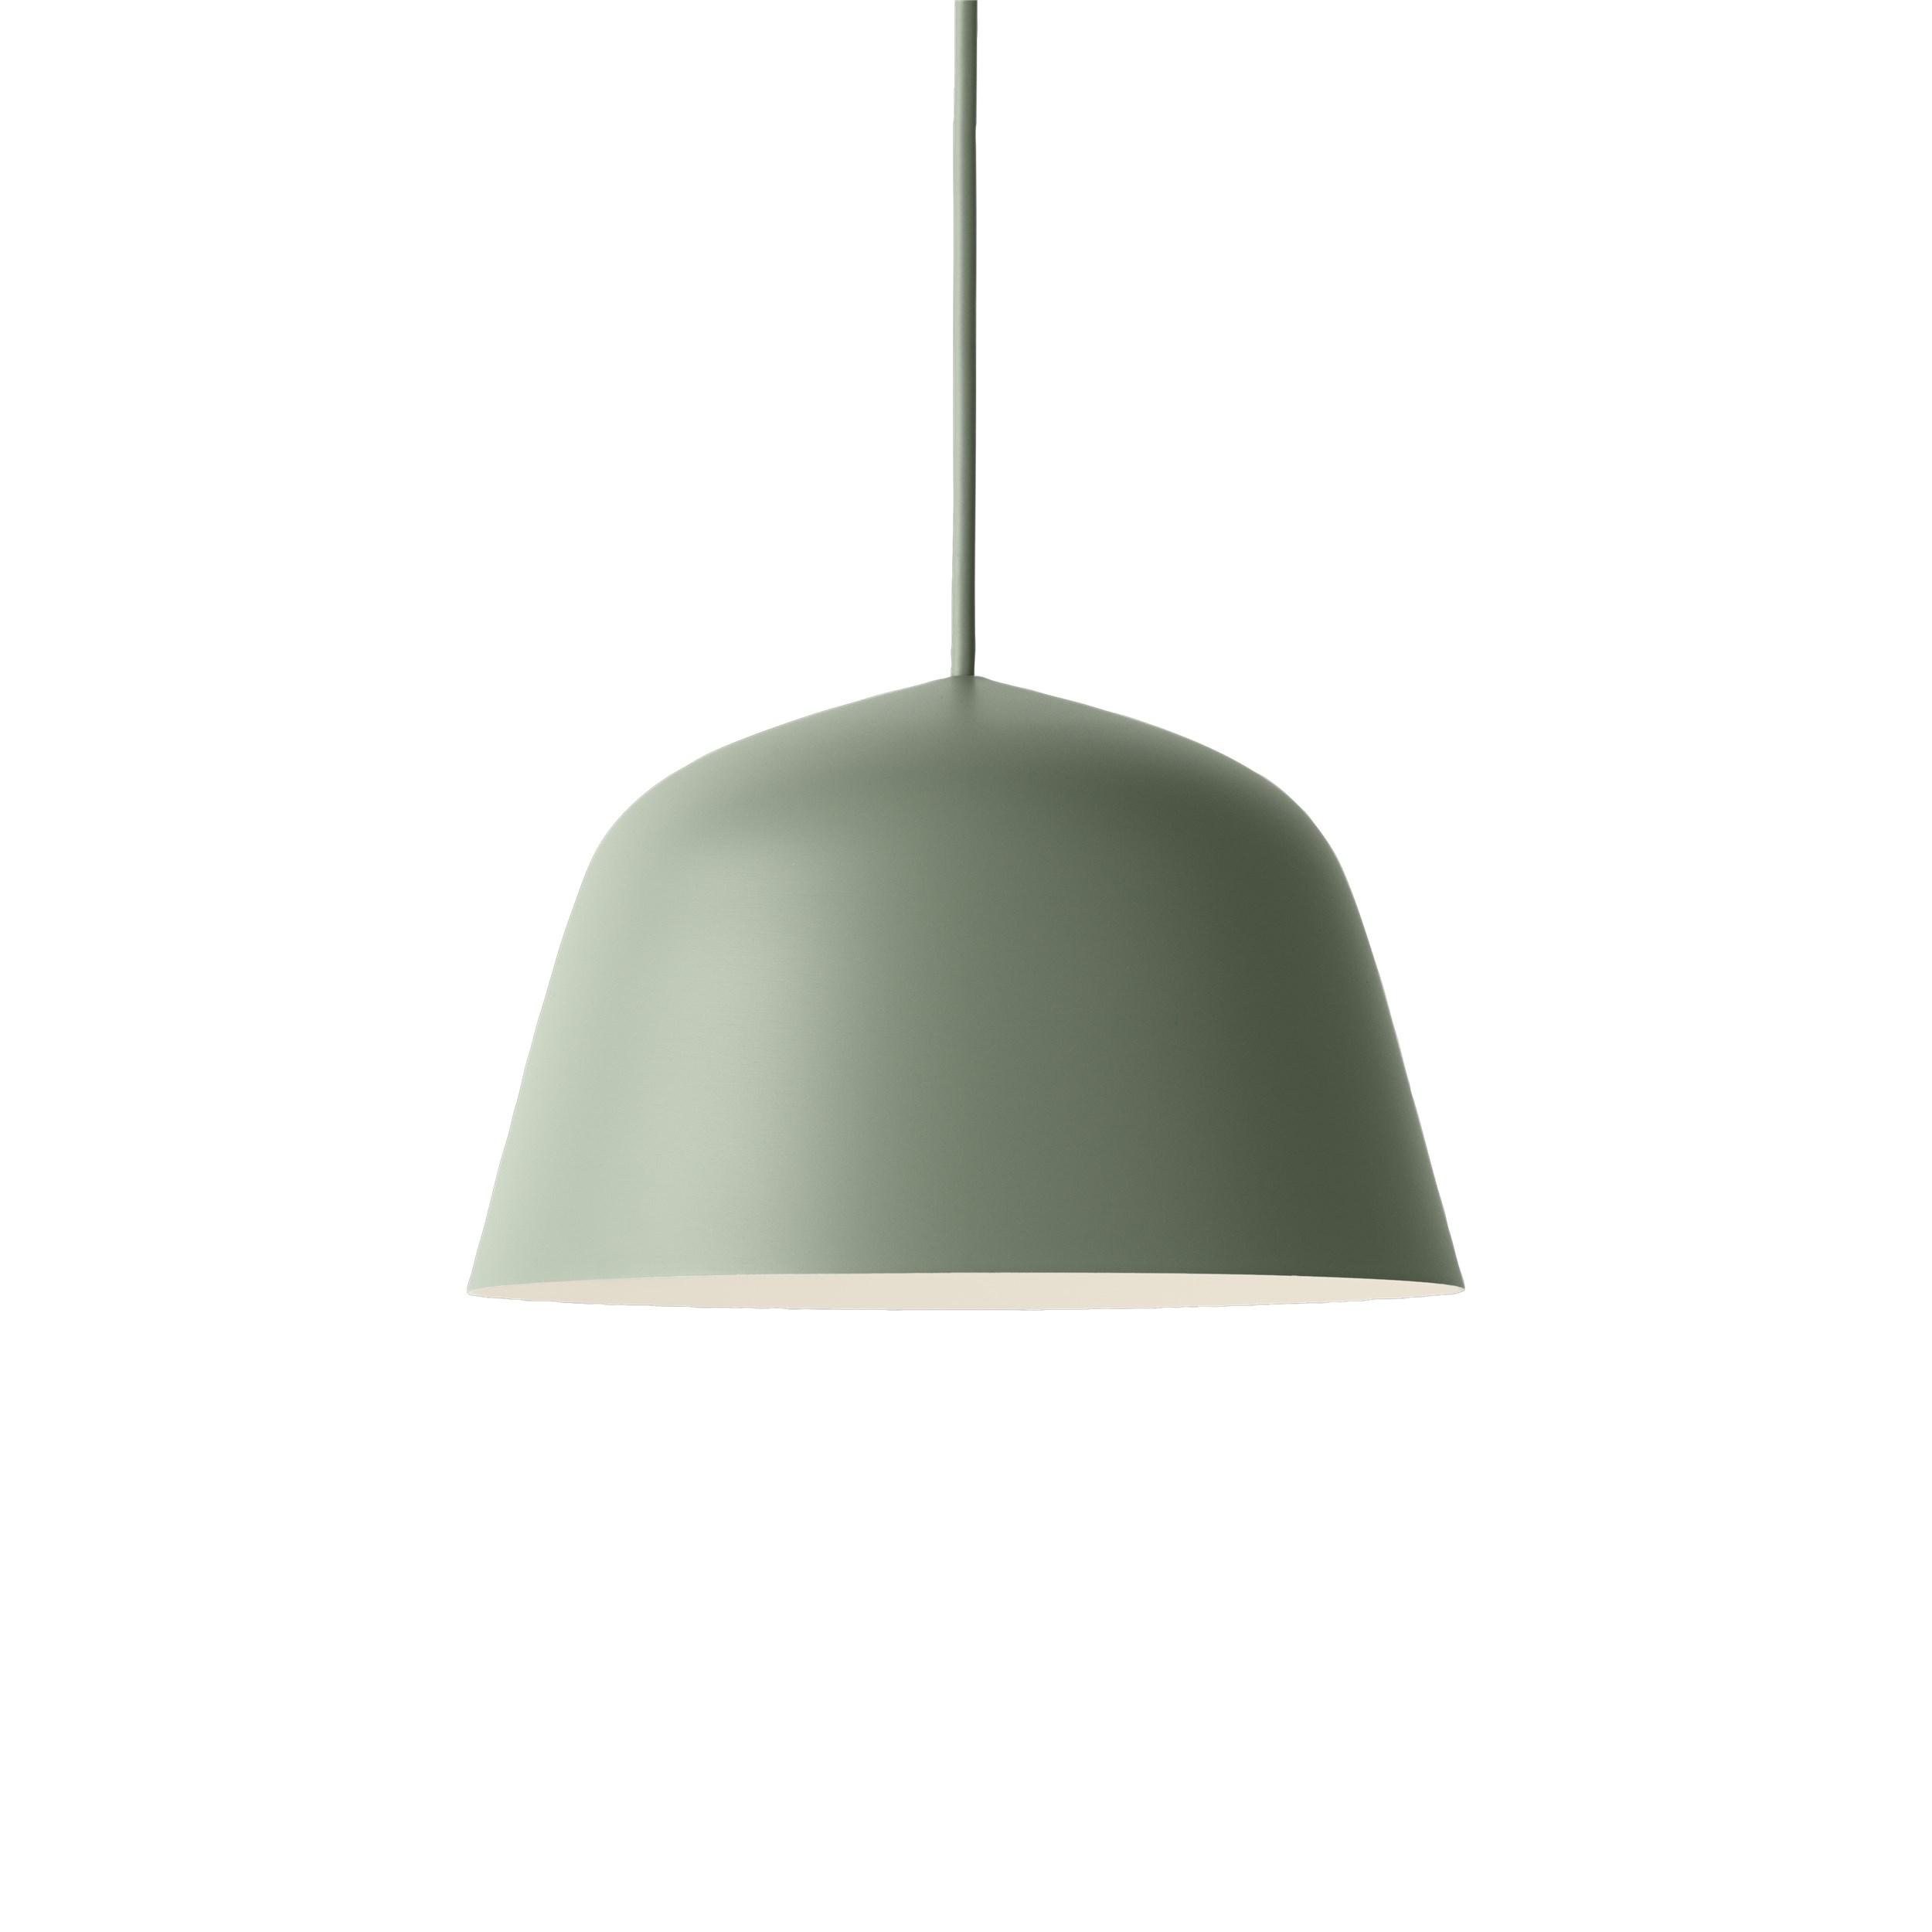 Ambit lamp 25 cm dusty green